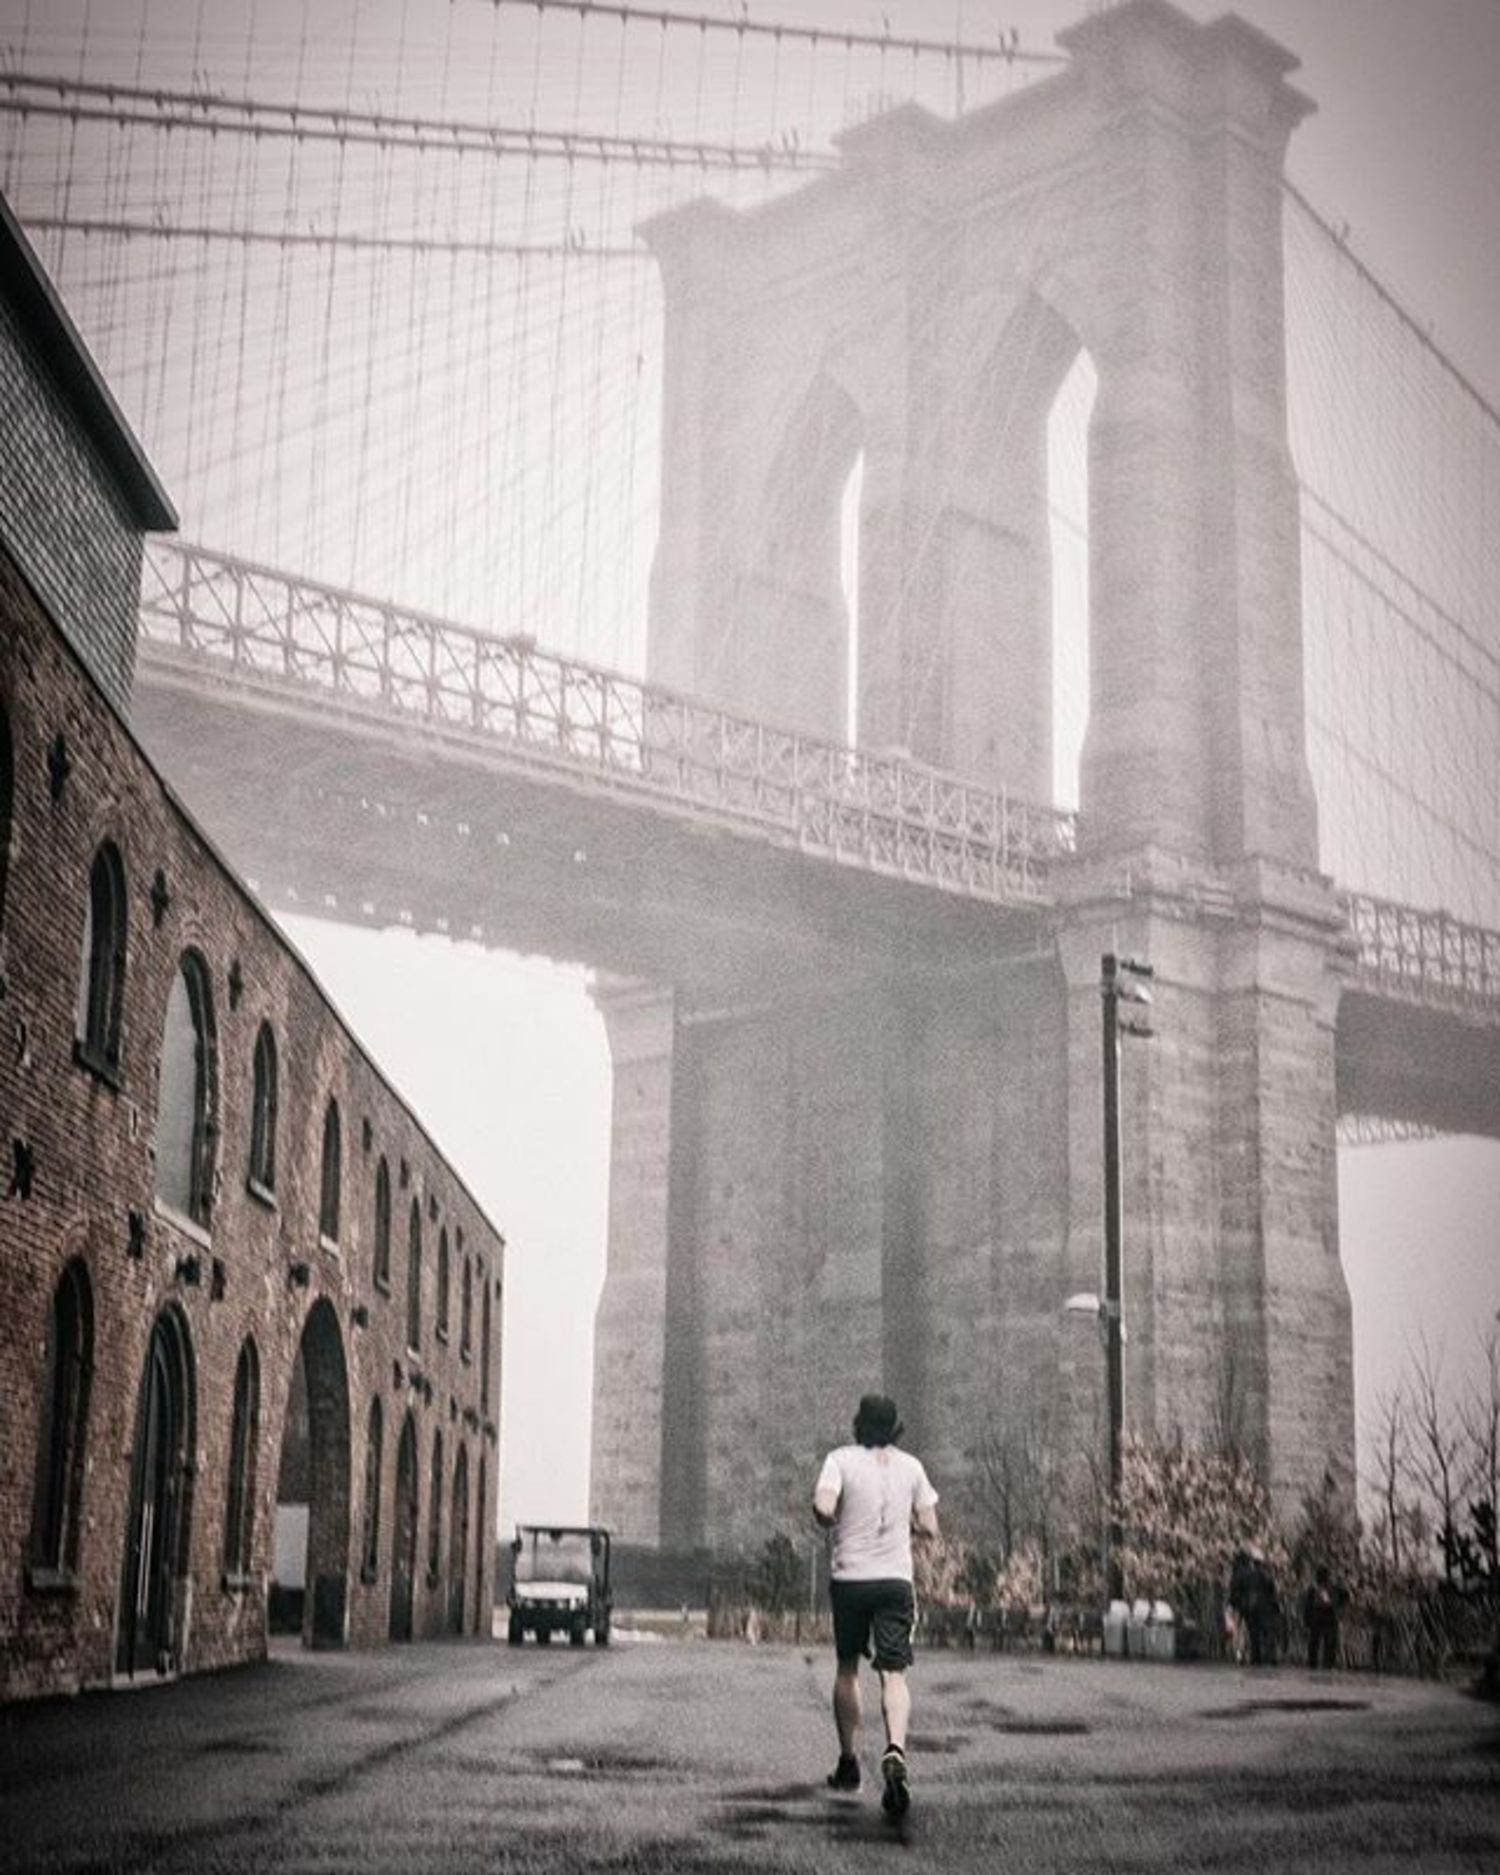 Brooklyn Bridge Park, Brooklyn. Photo via @bklyn_block #viewingnyc #newyork #newyorkcity #nyc